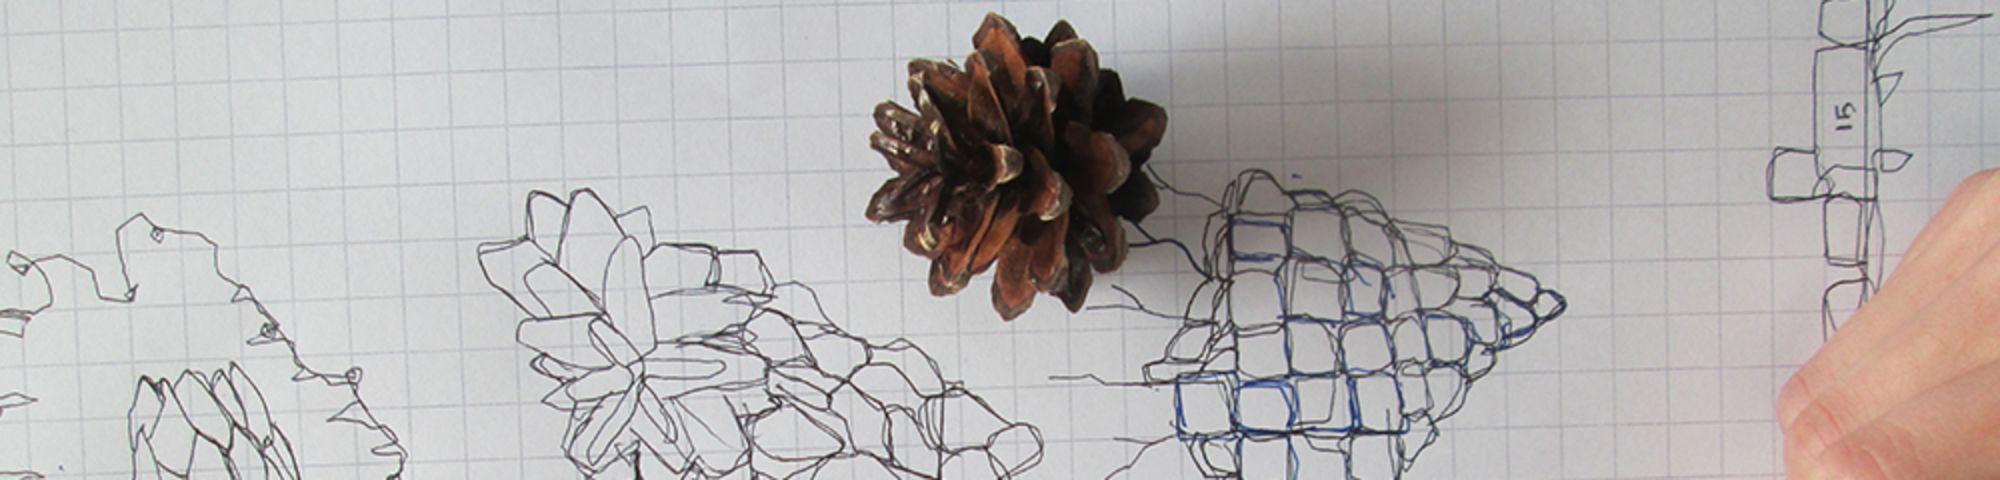 Embedding maths in art pine cone image